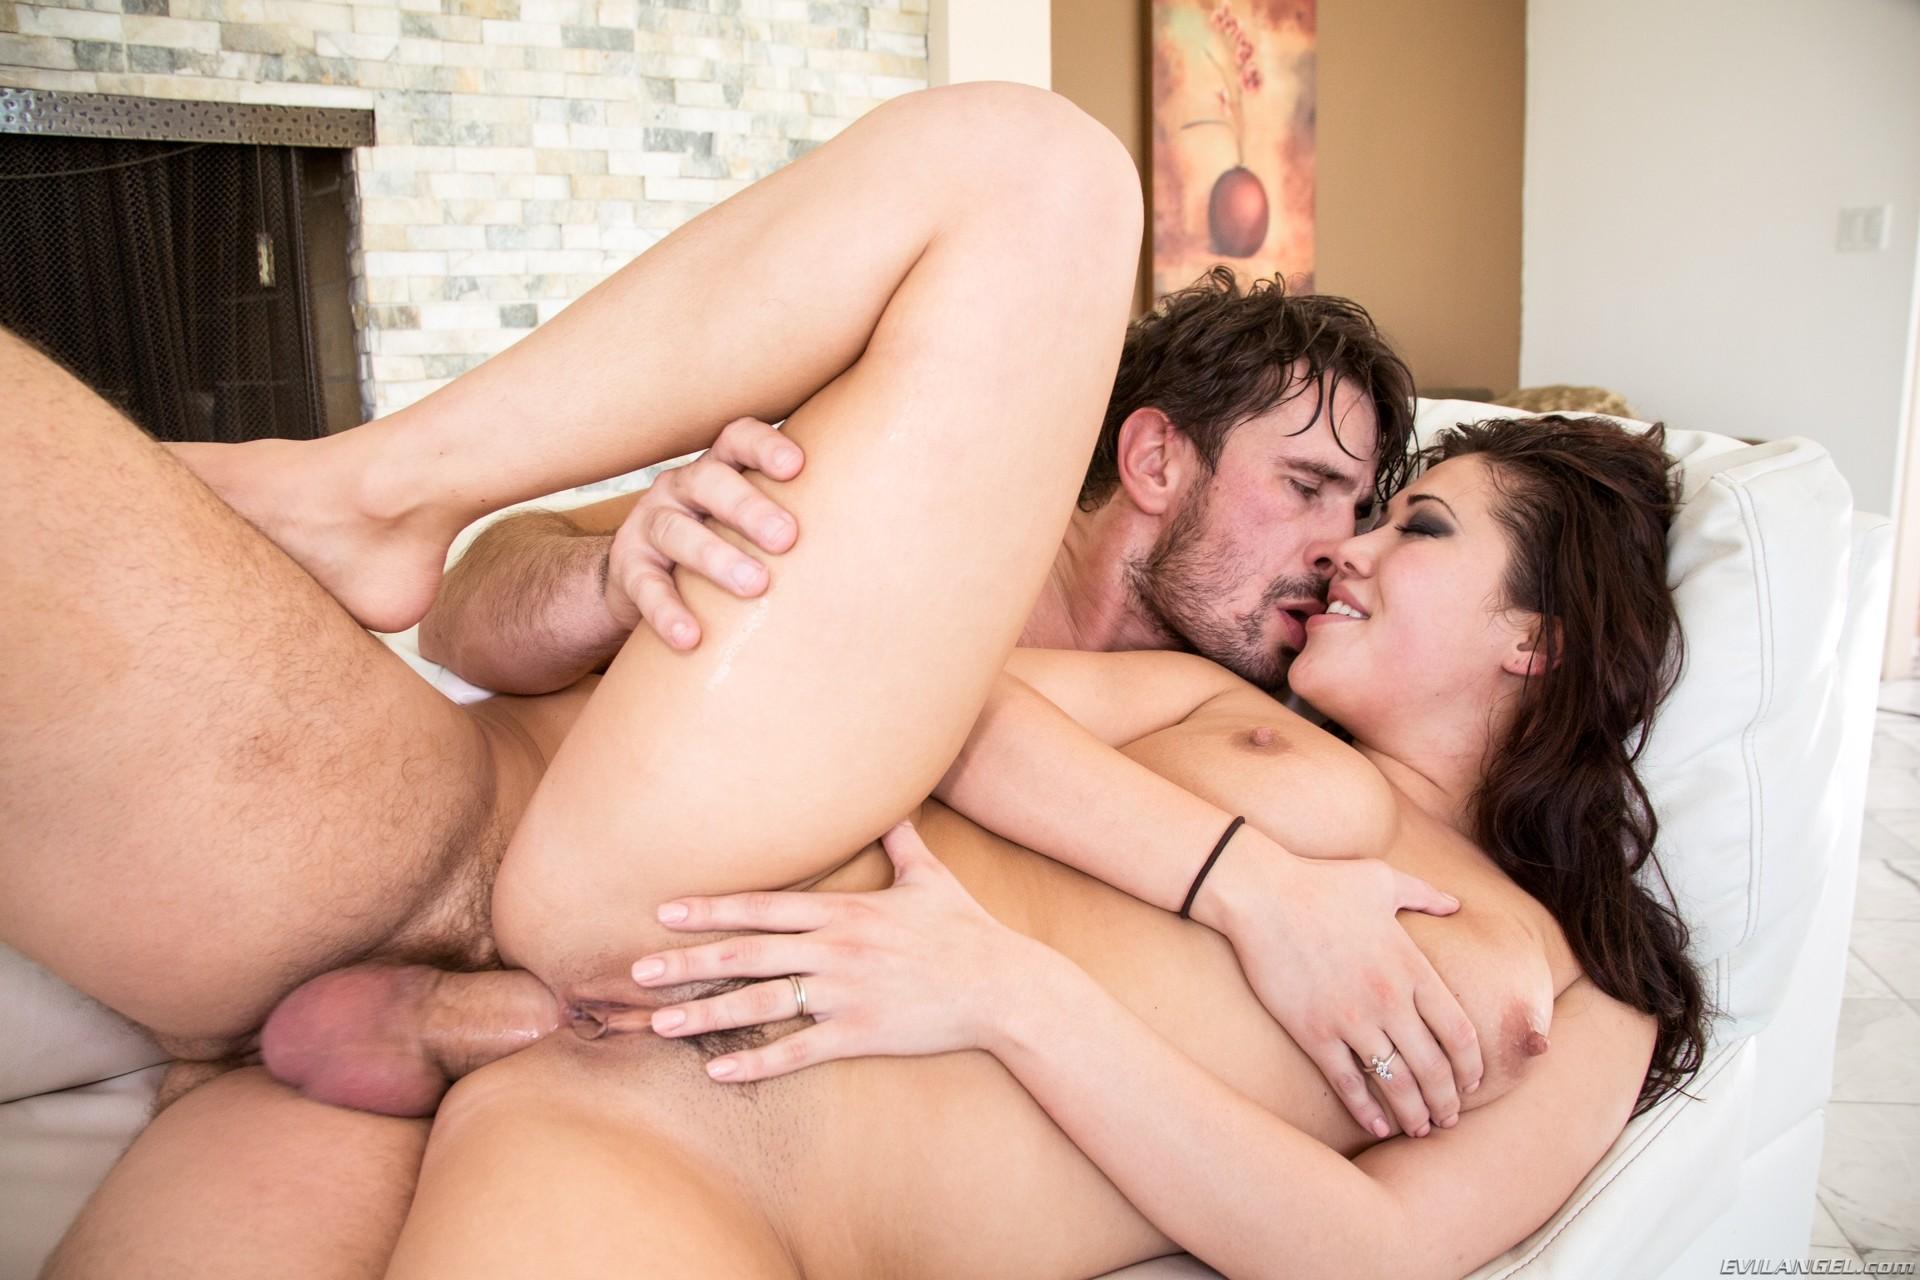 Russian girls porn